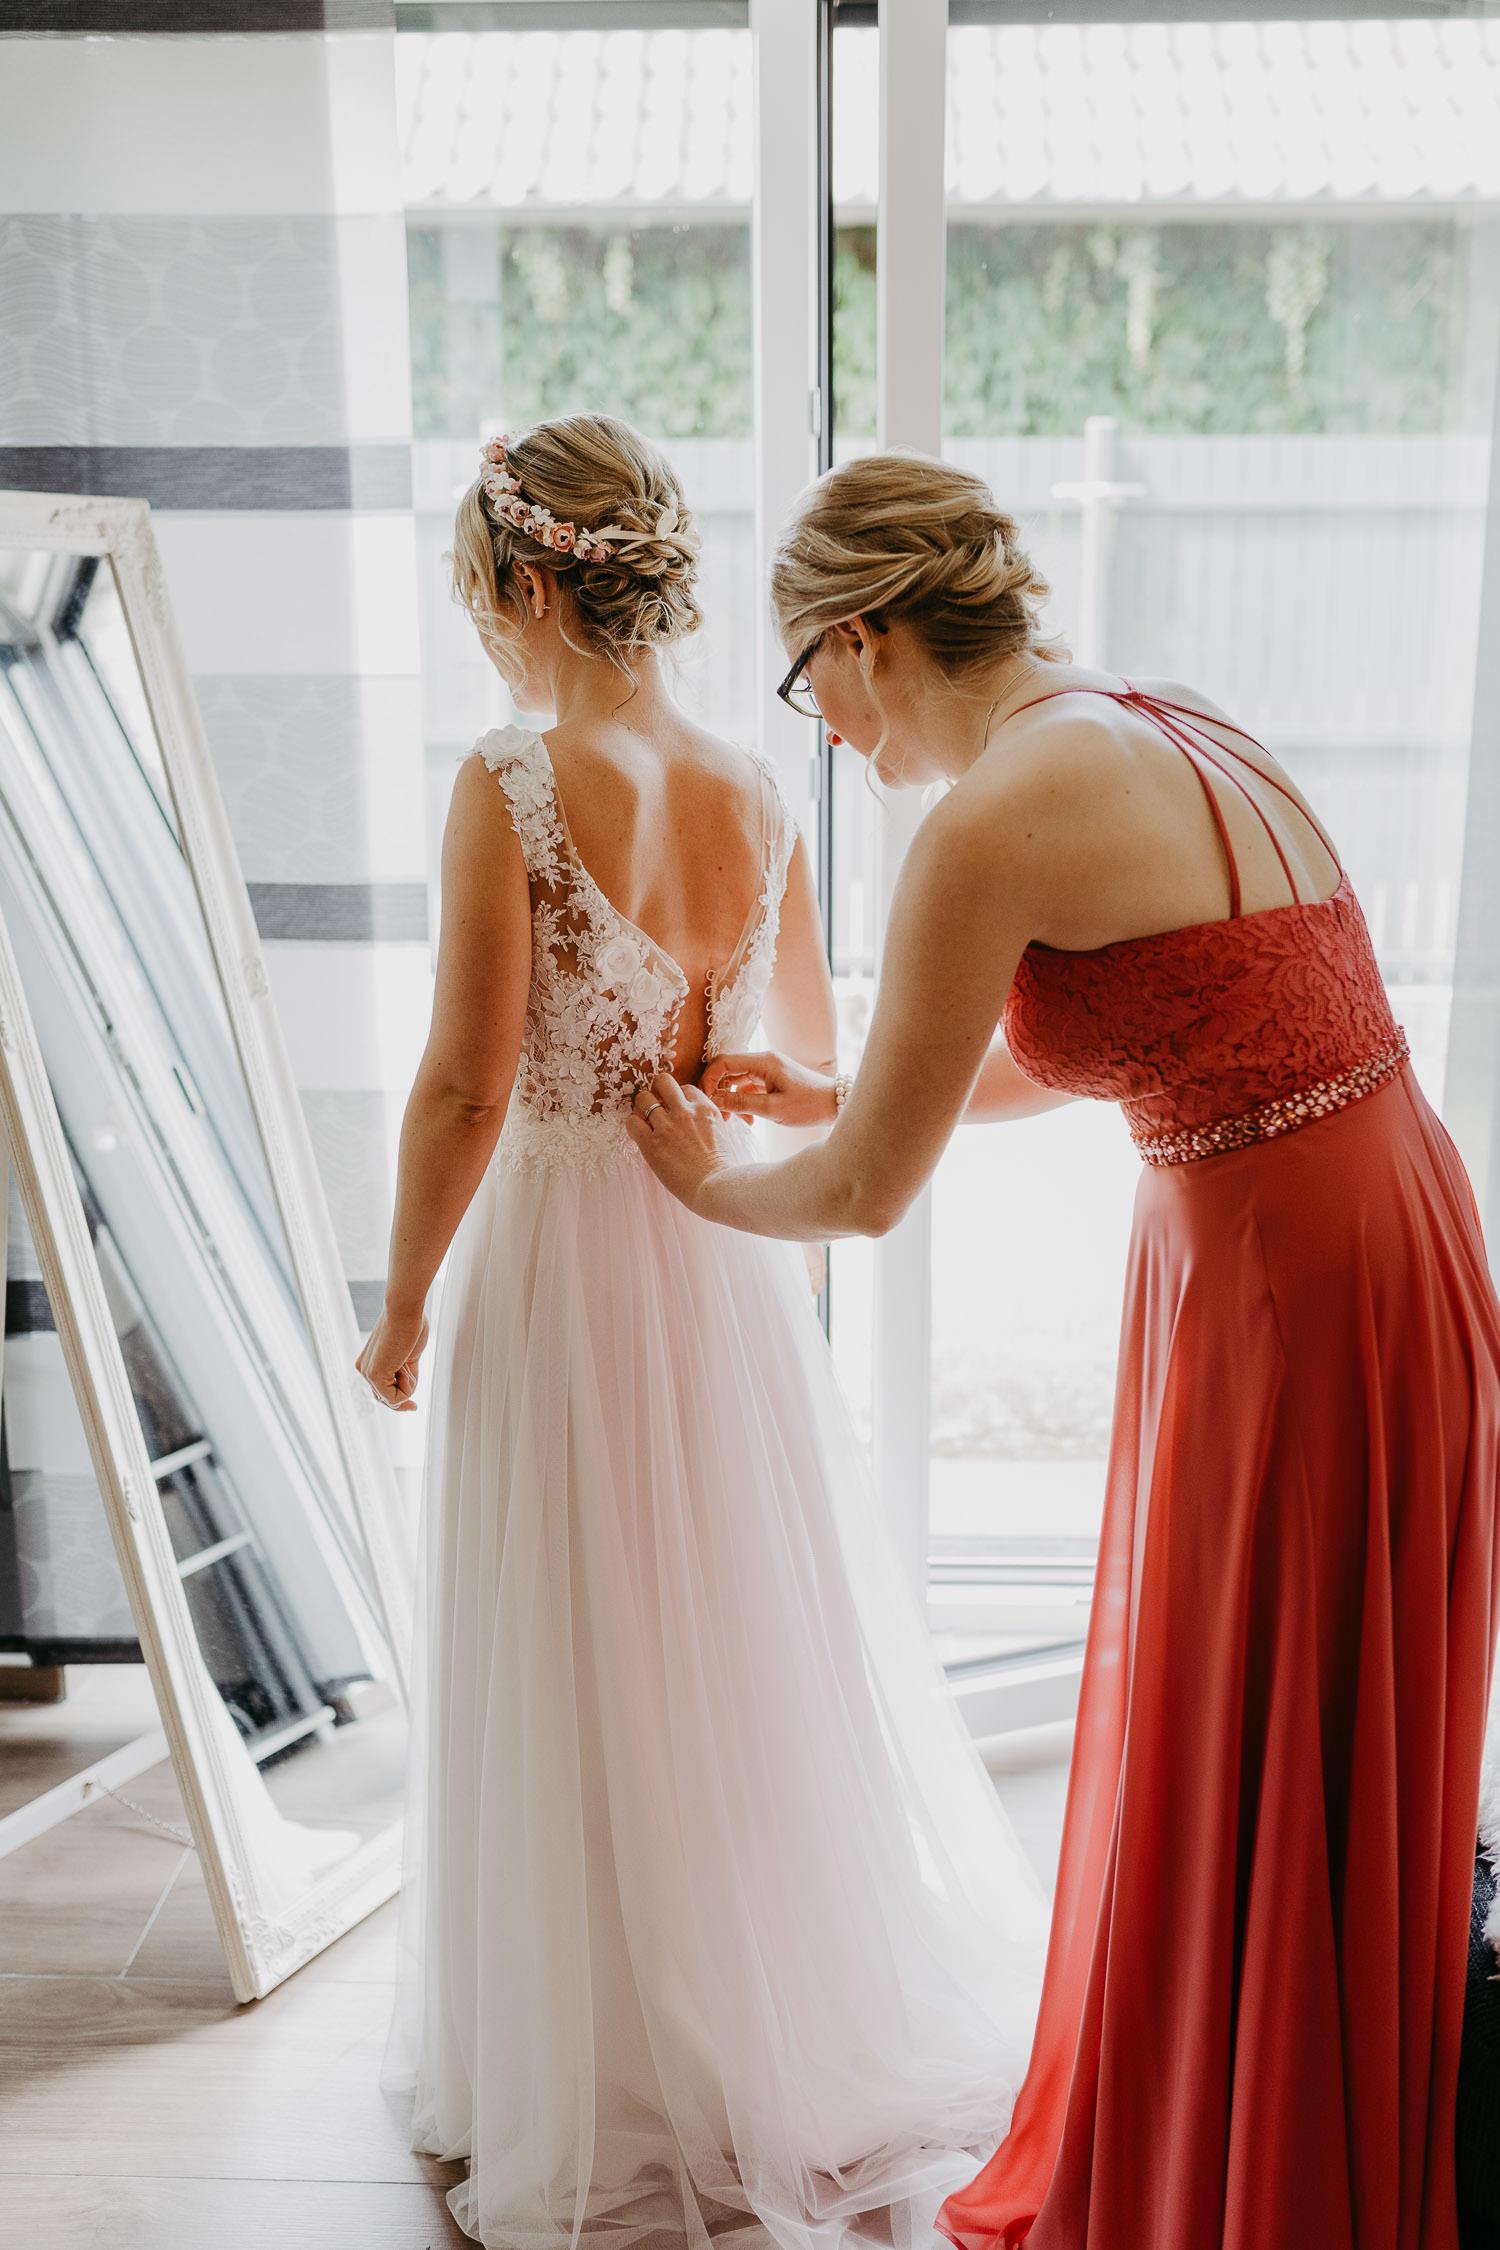 Freundin schließt Knöpfe an Brautkleid